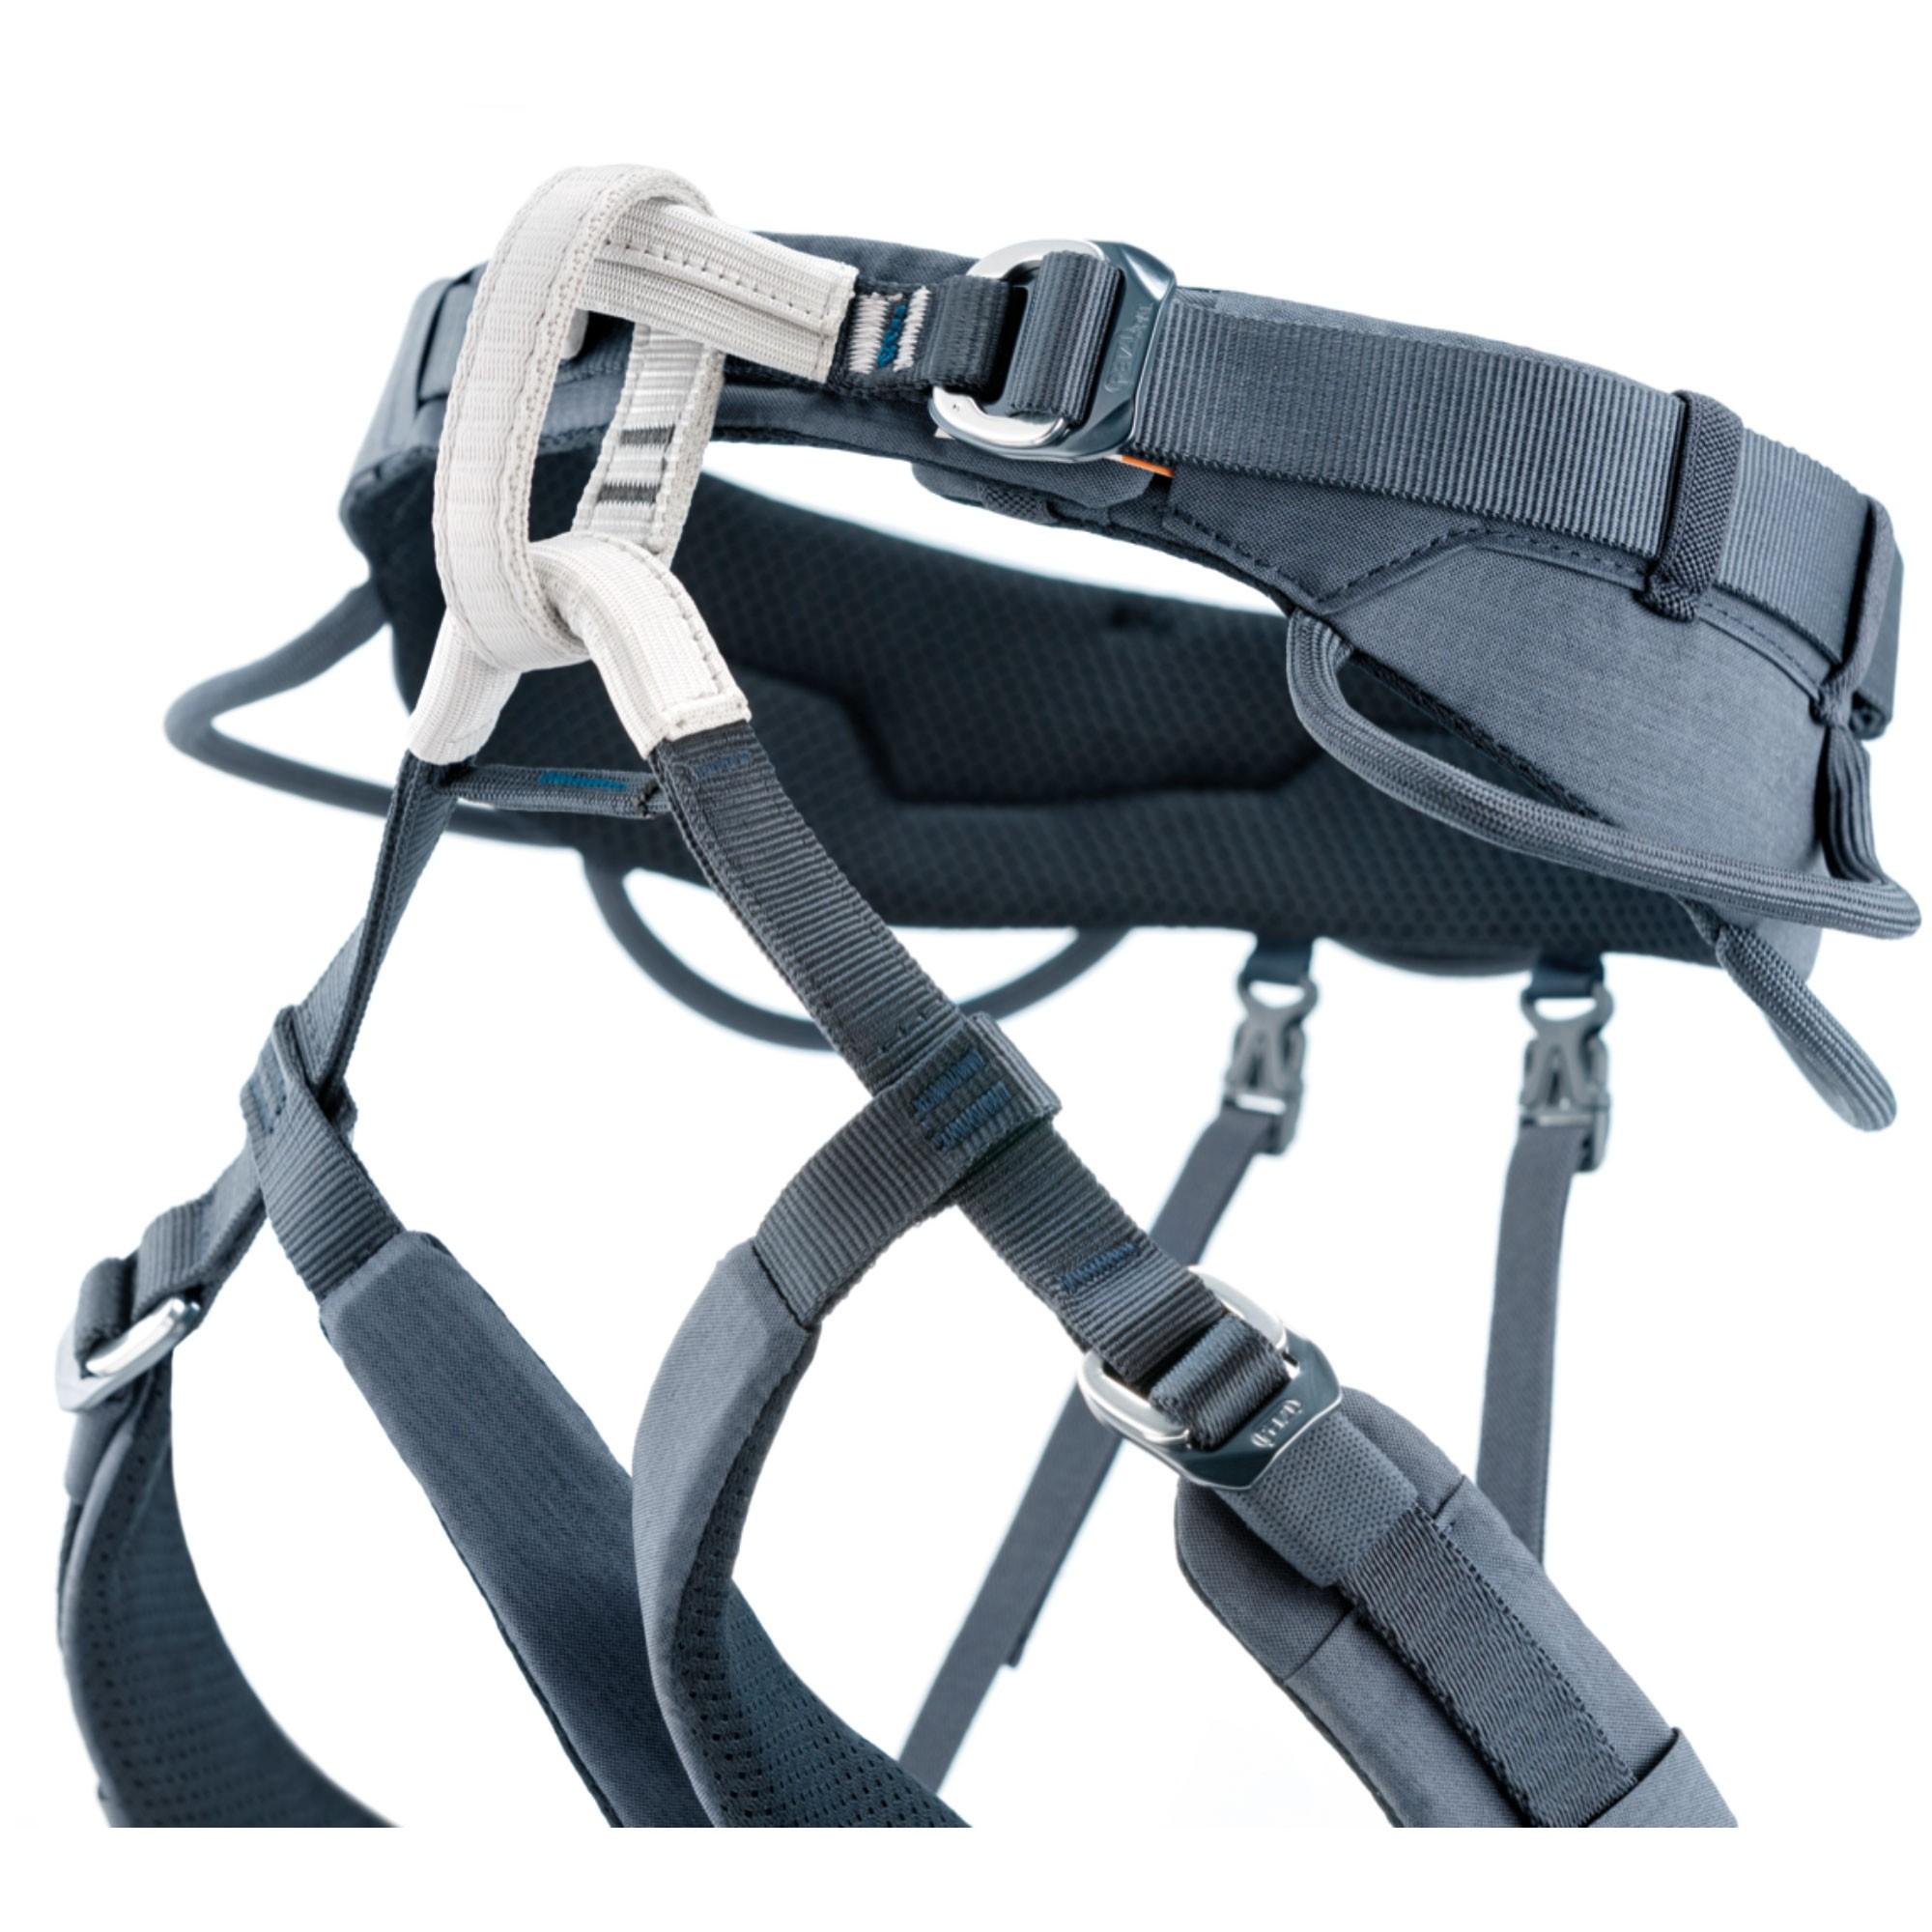 PETZL - Adjama Climbing Harness - Blue